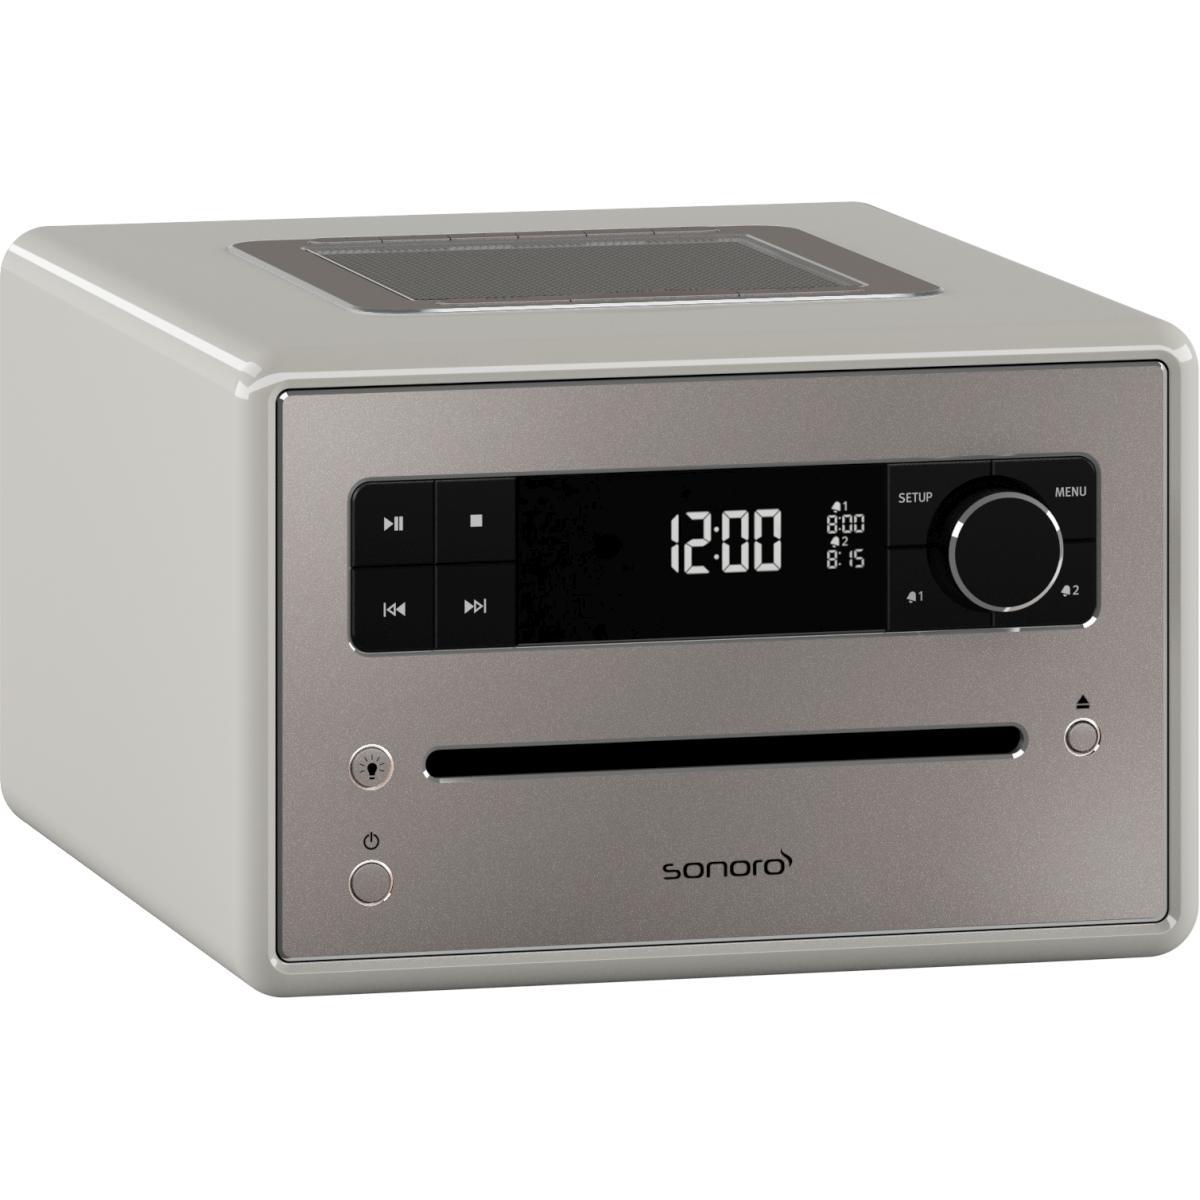 sonoro Qubo Audiosystem sandstein